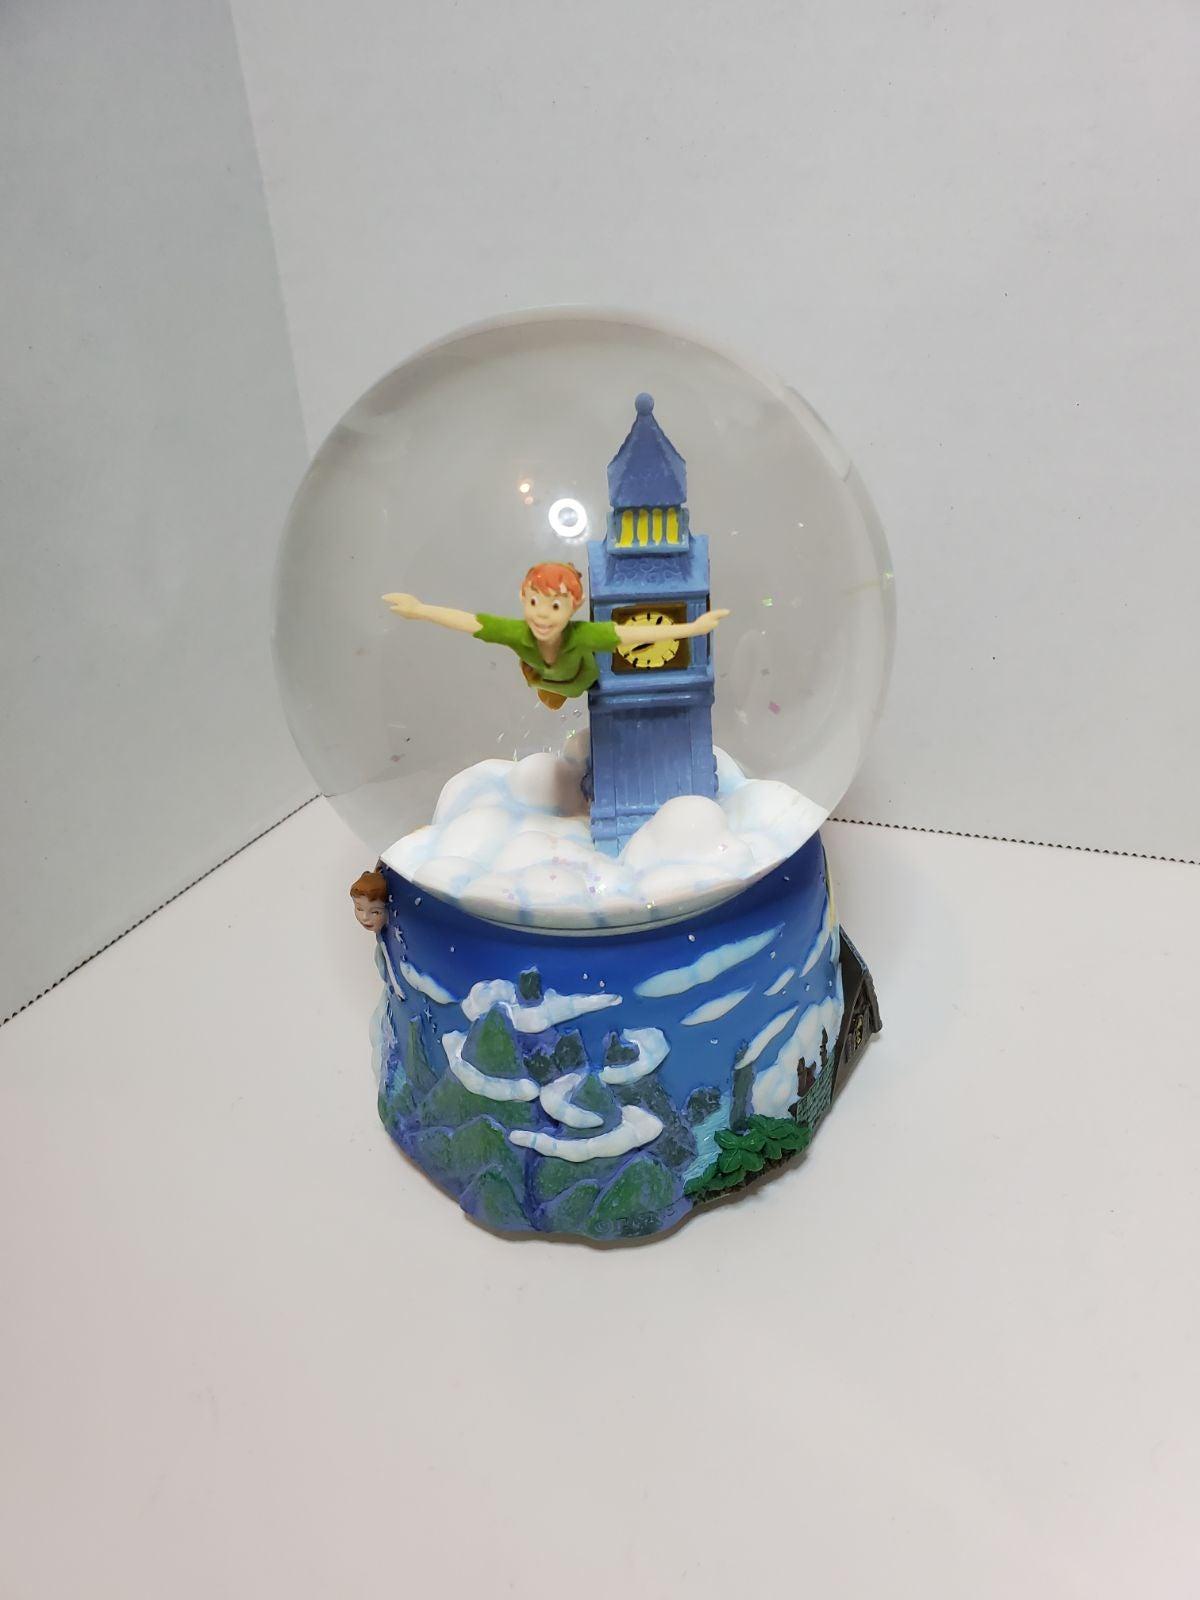 Peter pan snowglobe